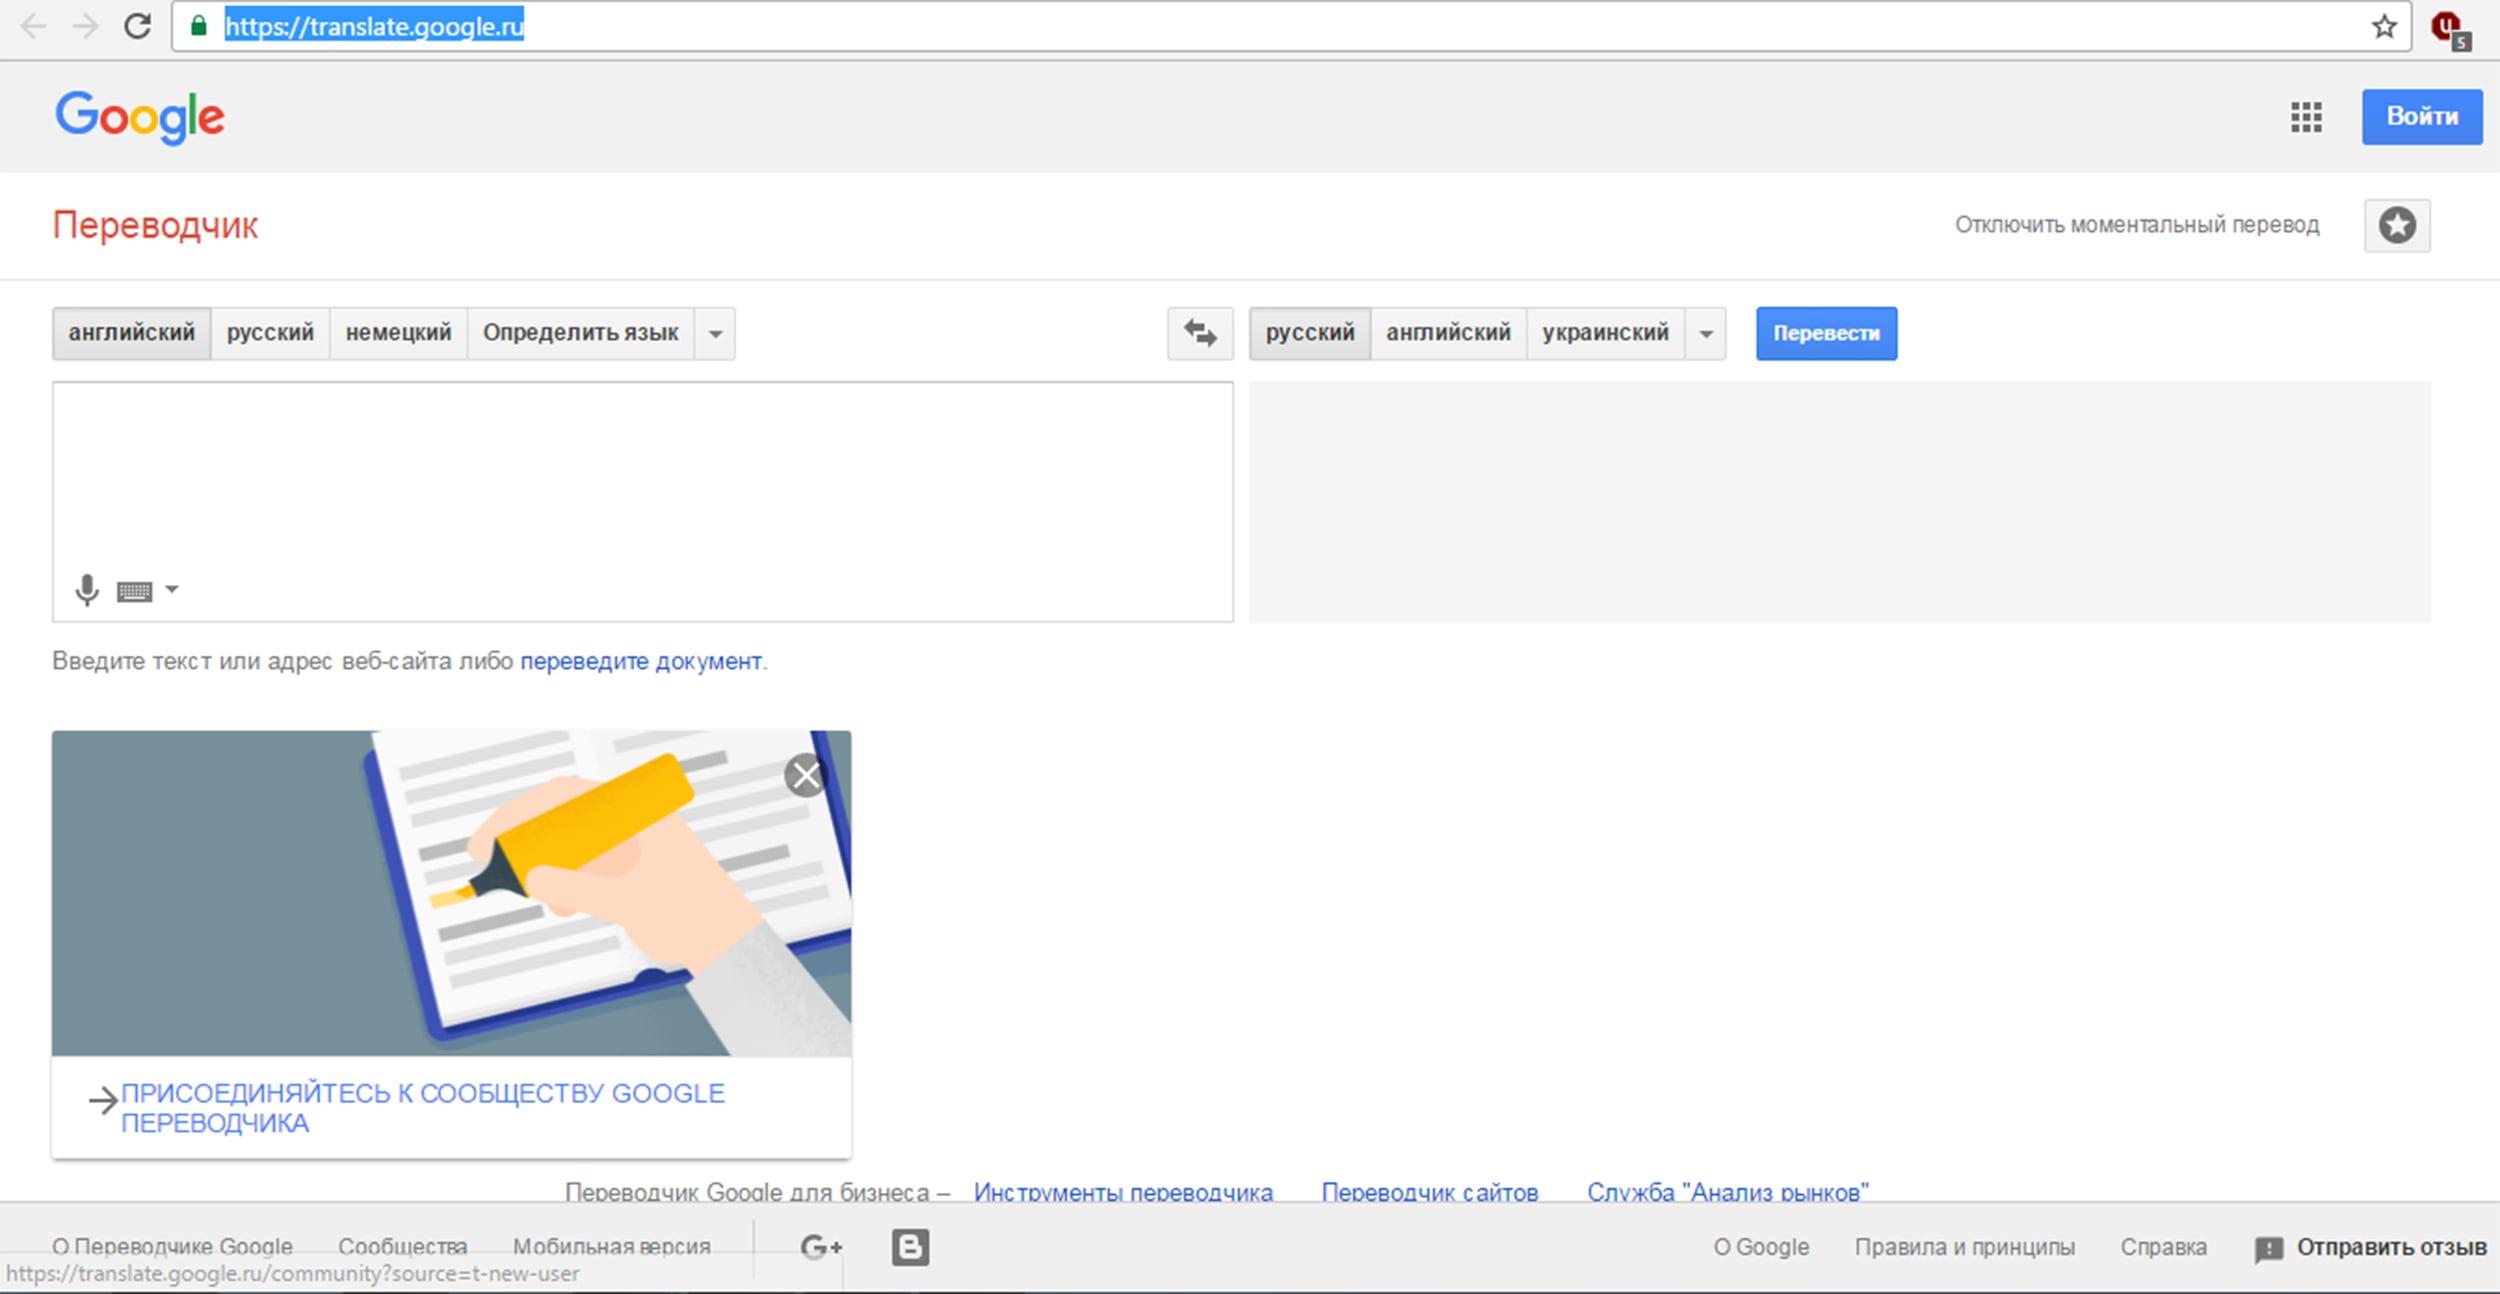 перевод через гугл переводчик